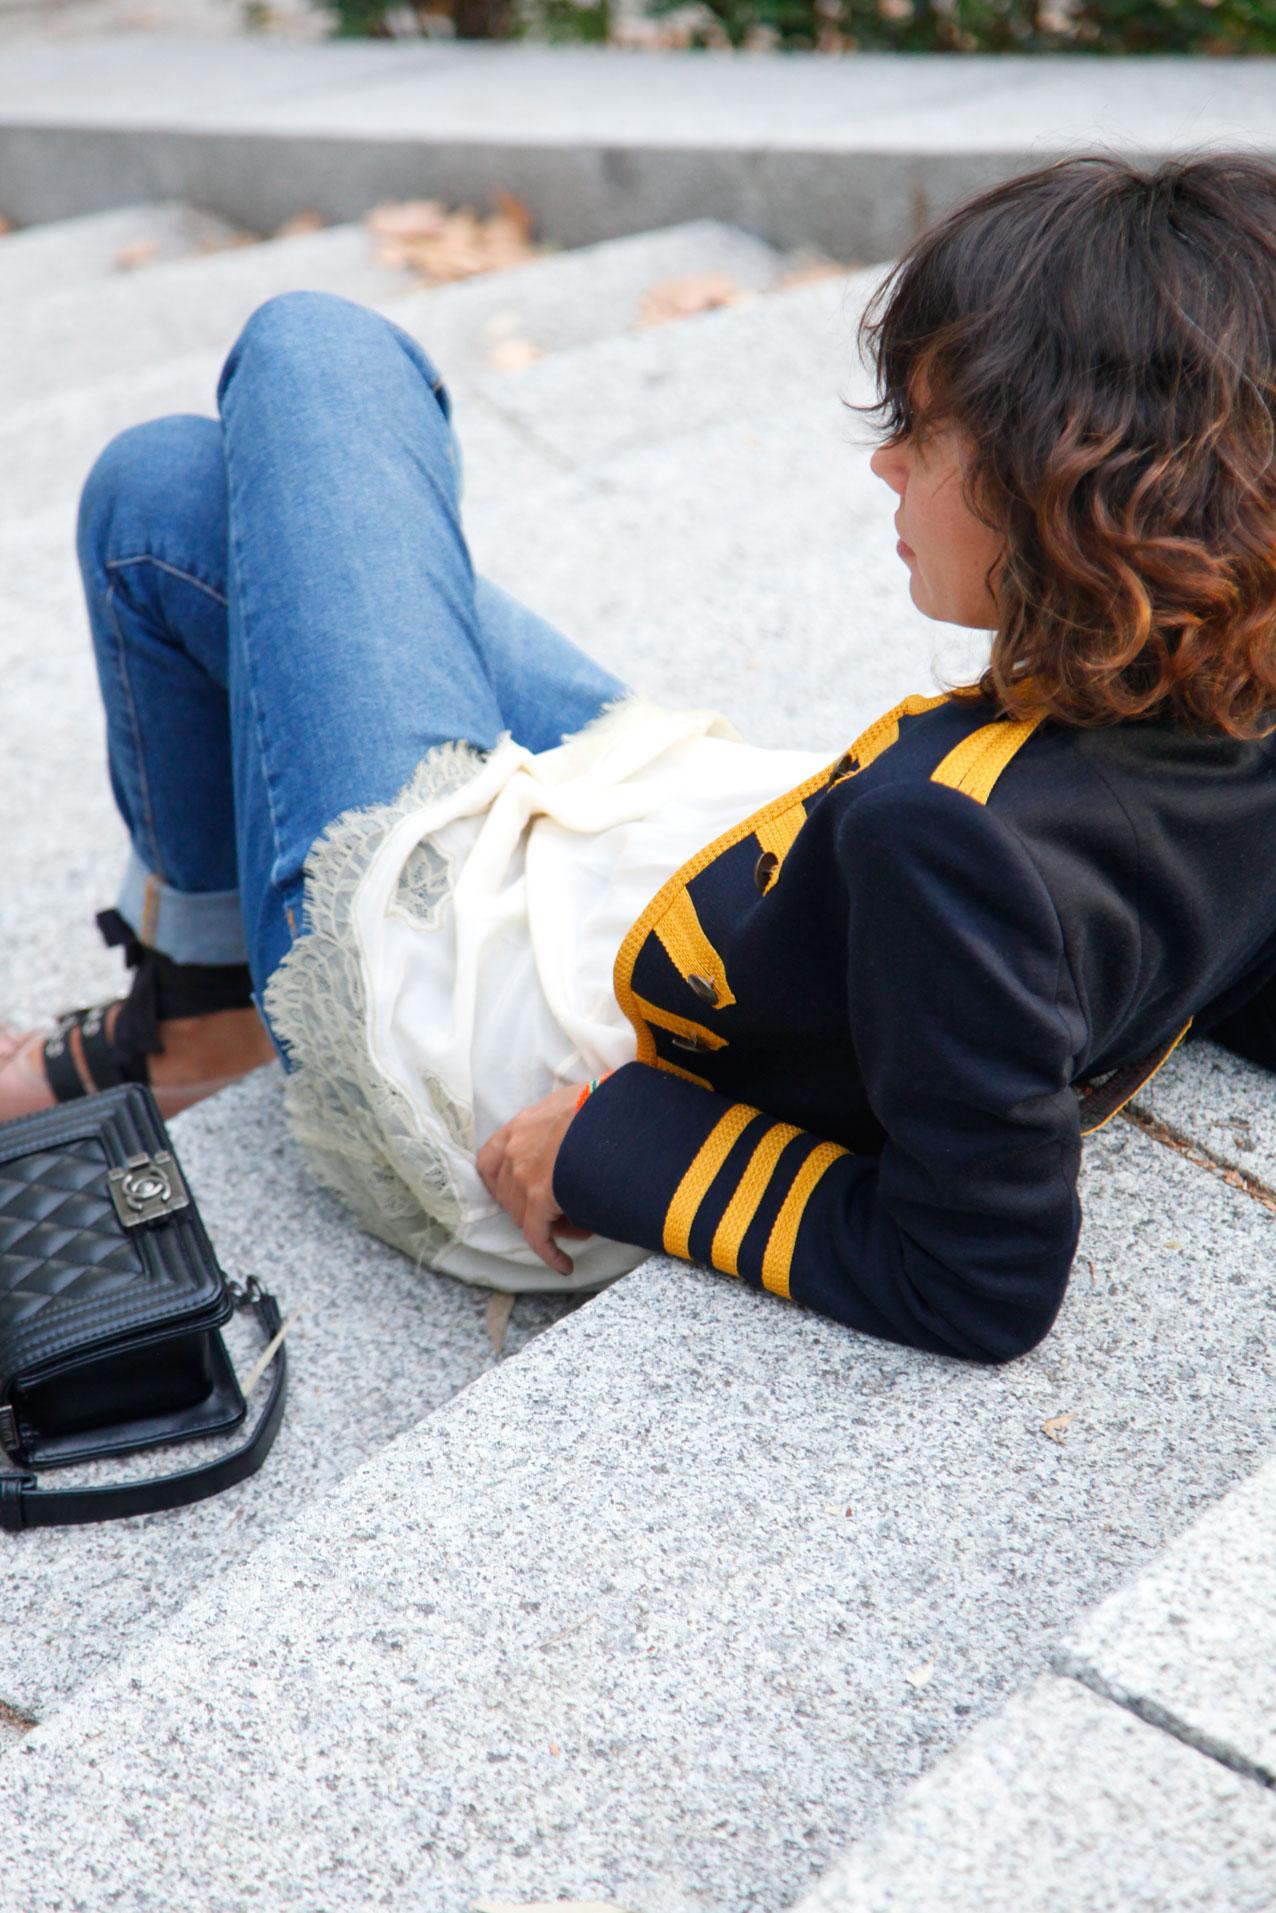 militar_jacket-lencero_autumn_look_miumiu_ballerinas_streetstyle-cool_lemonade-6